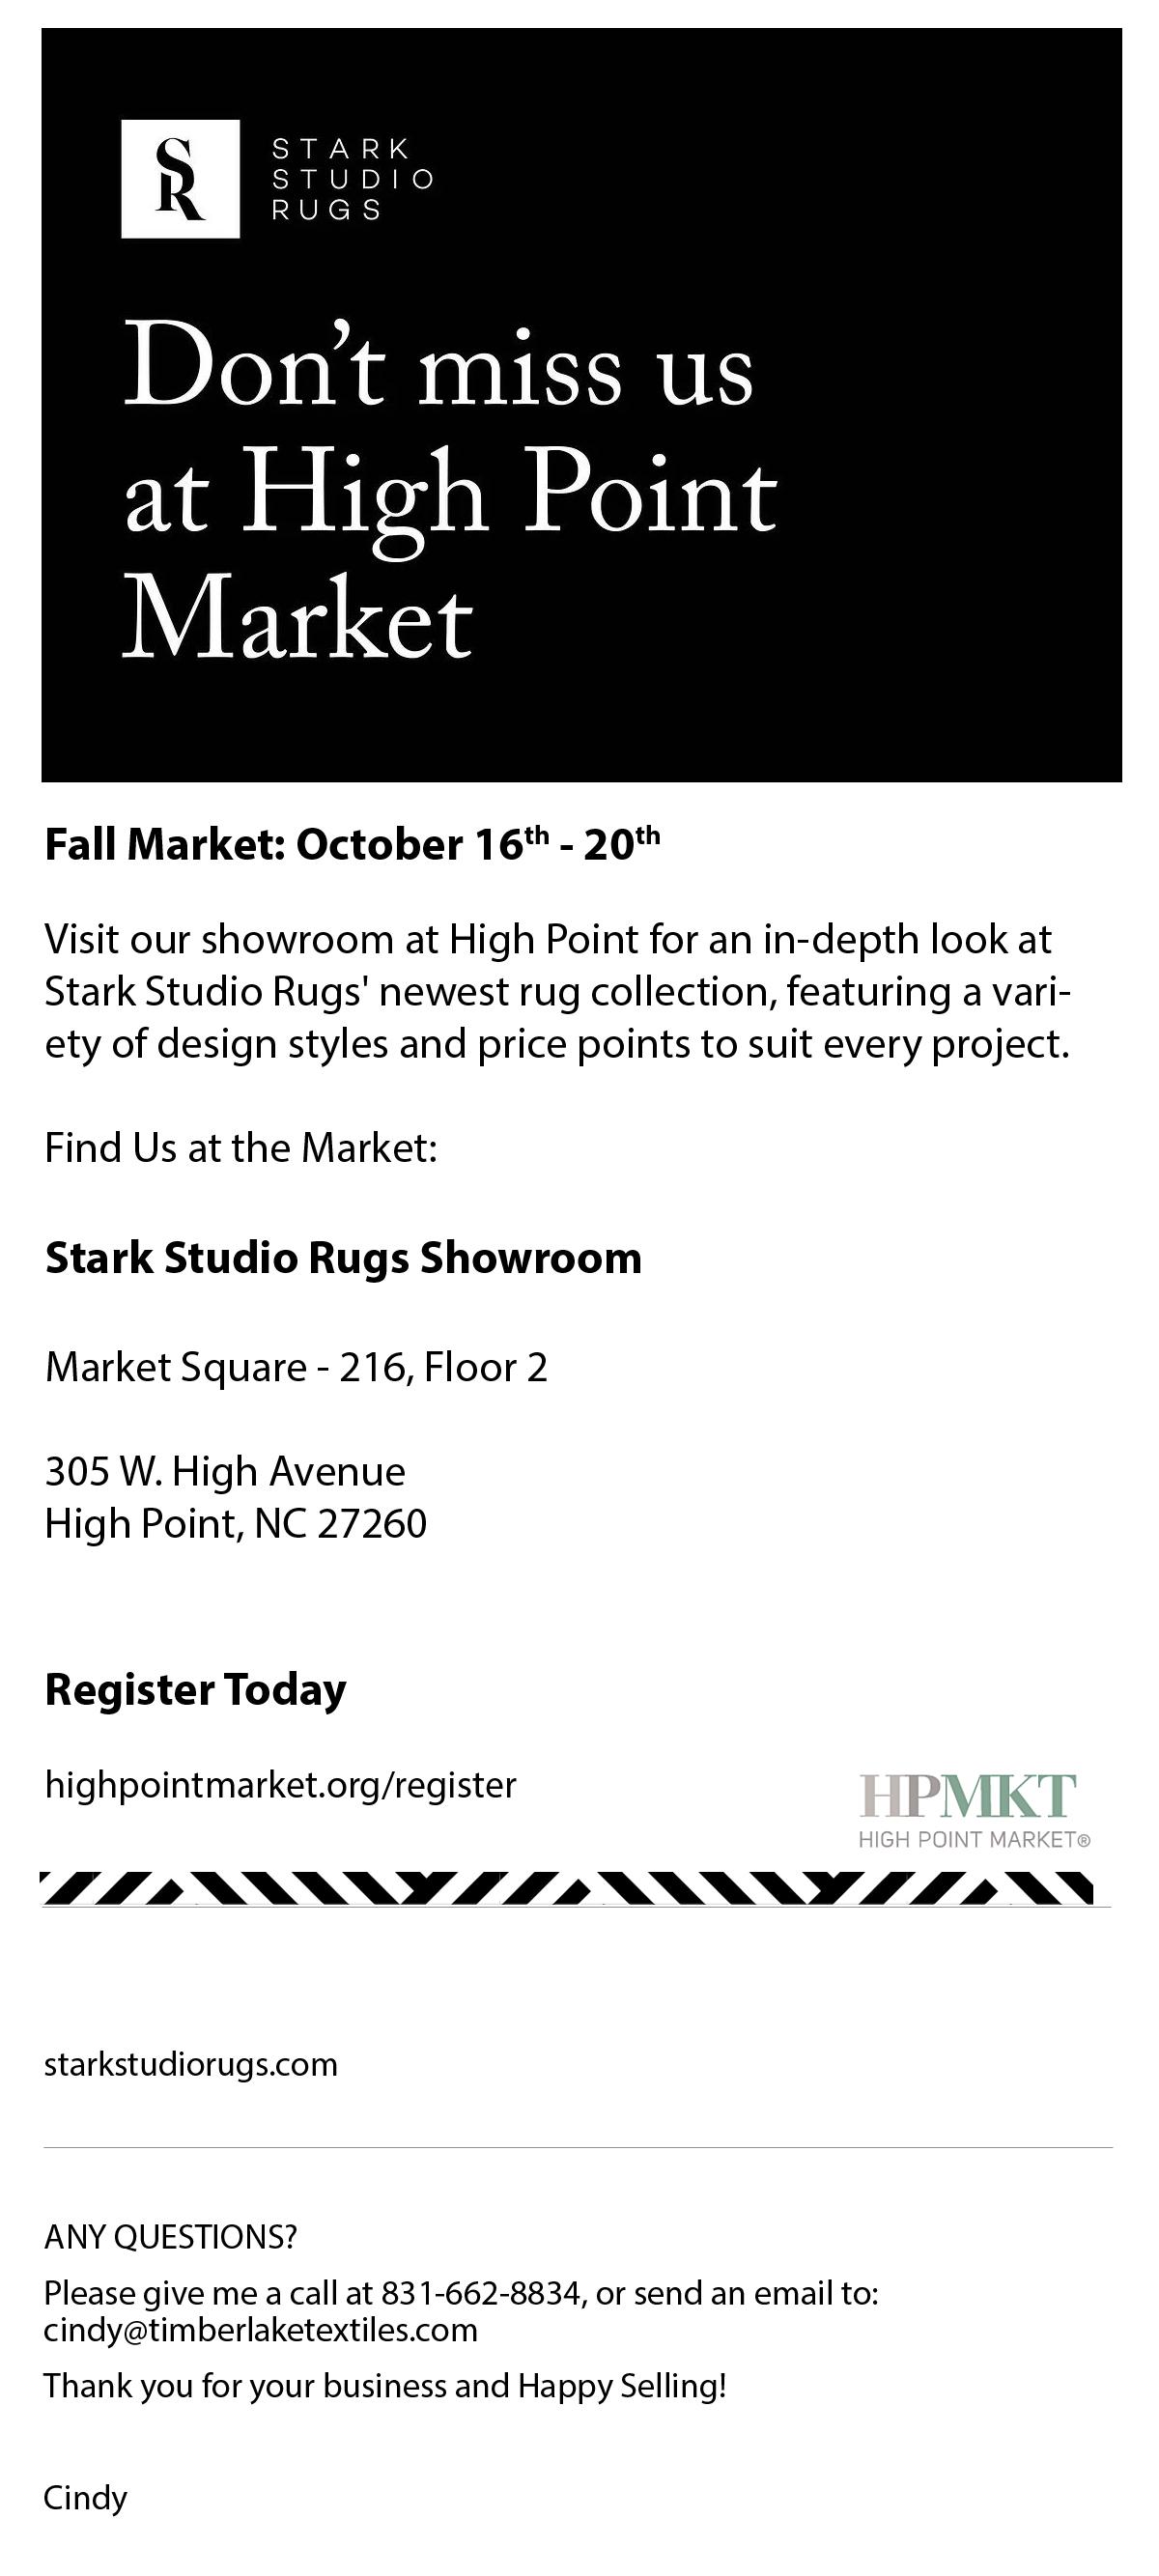 2021-Stark Studio Rugs High Point Market is Here!